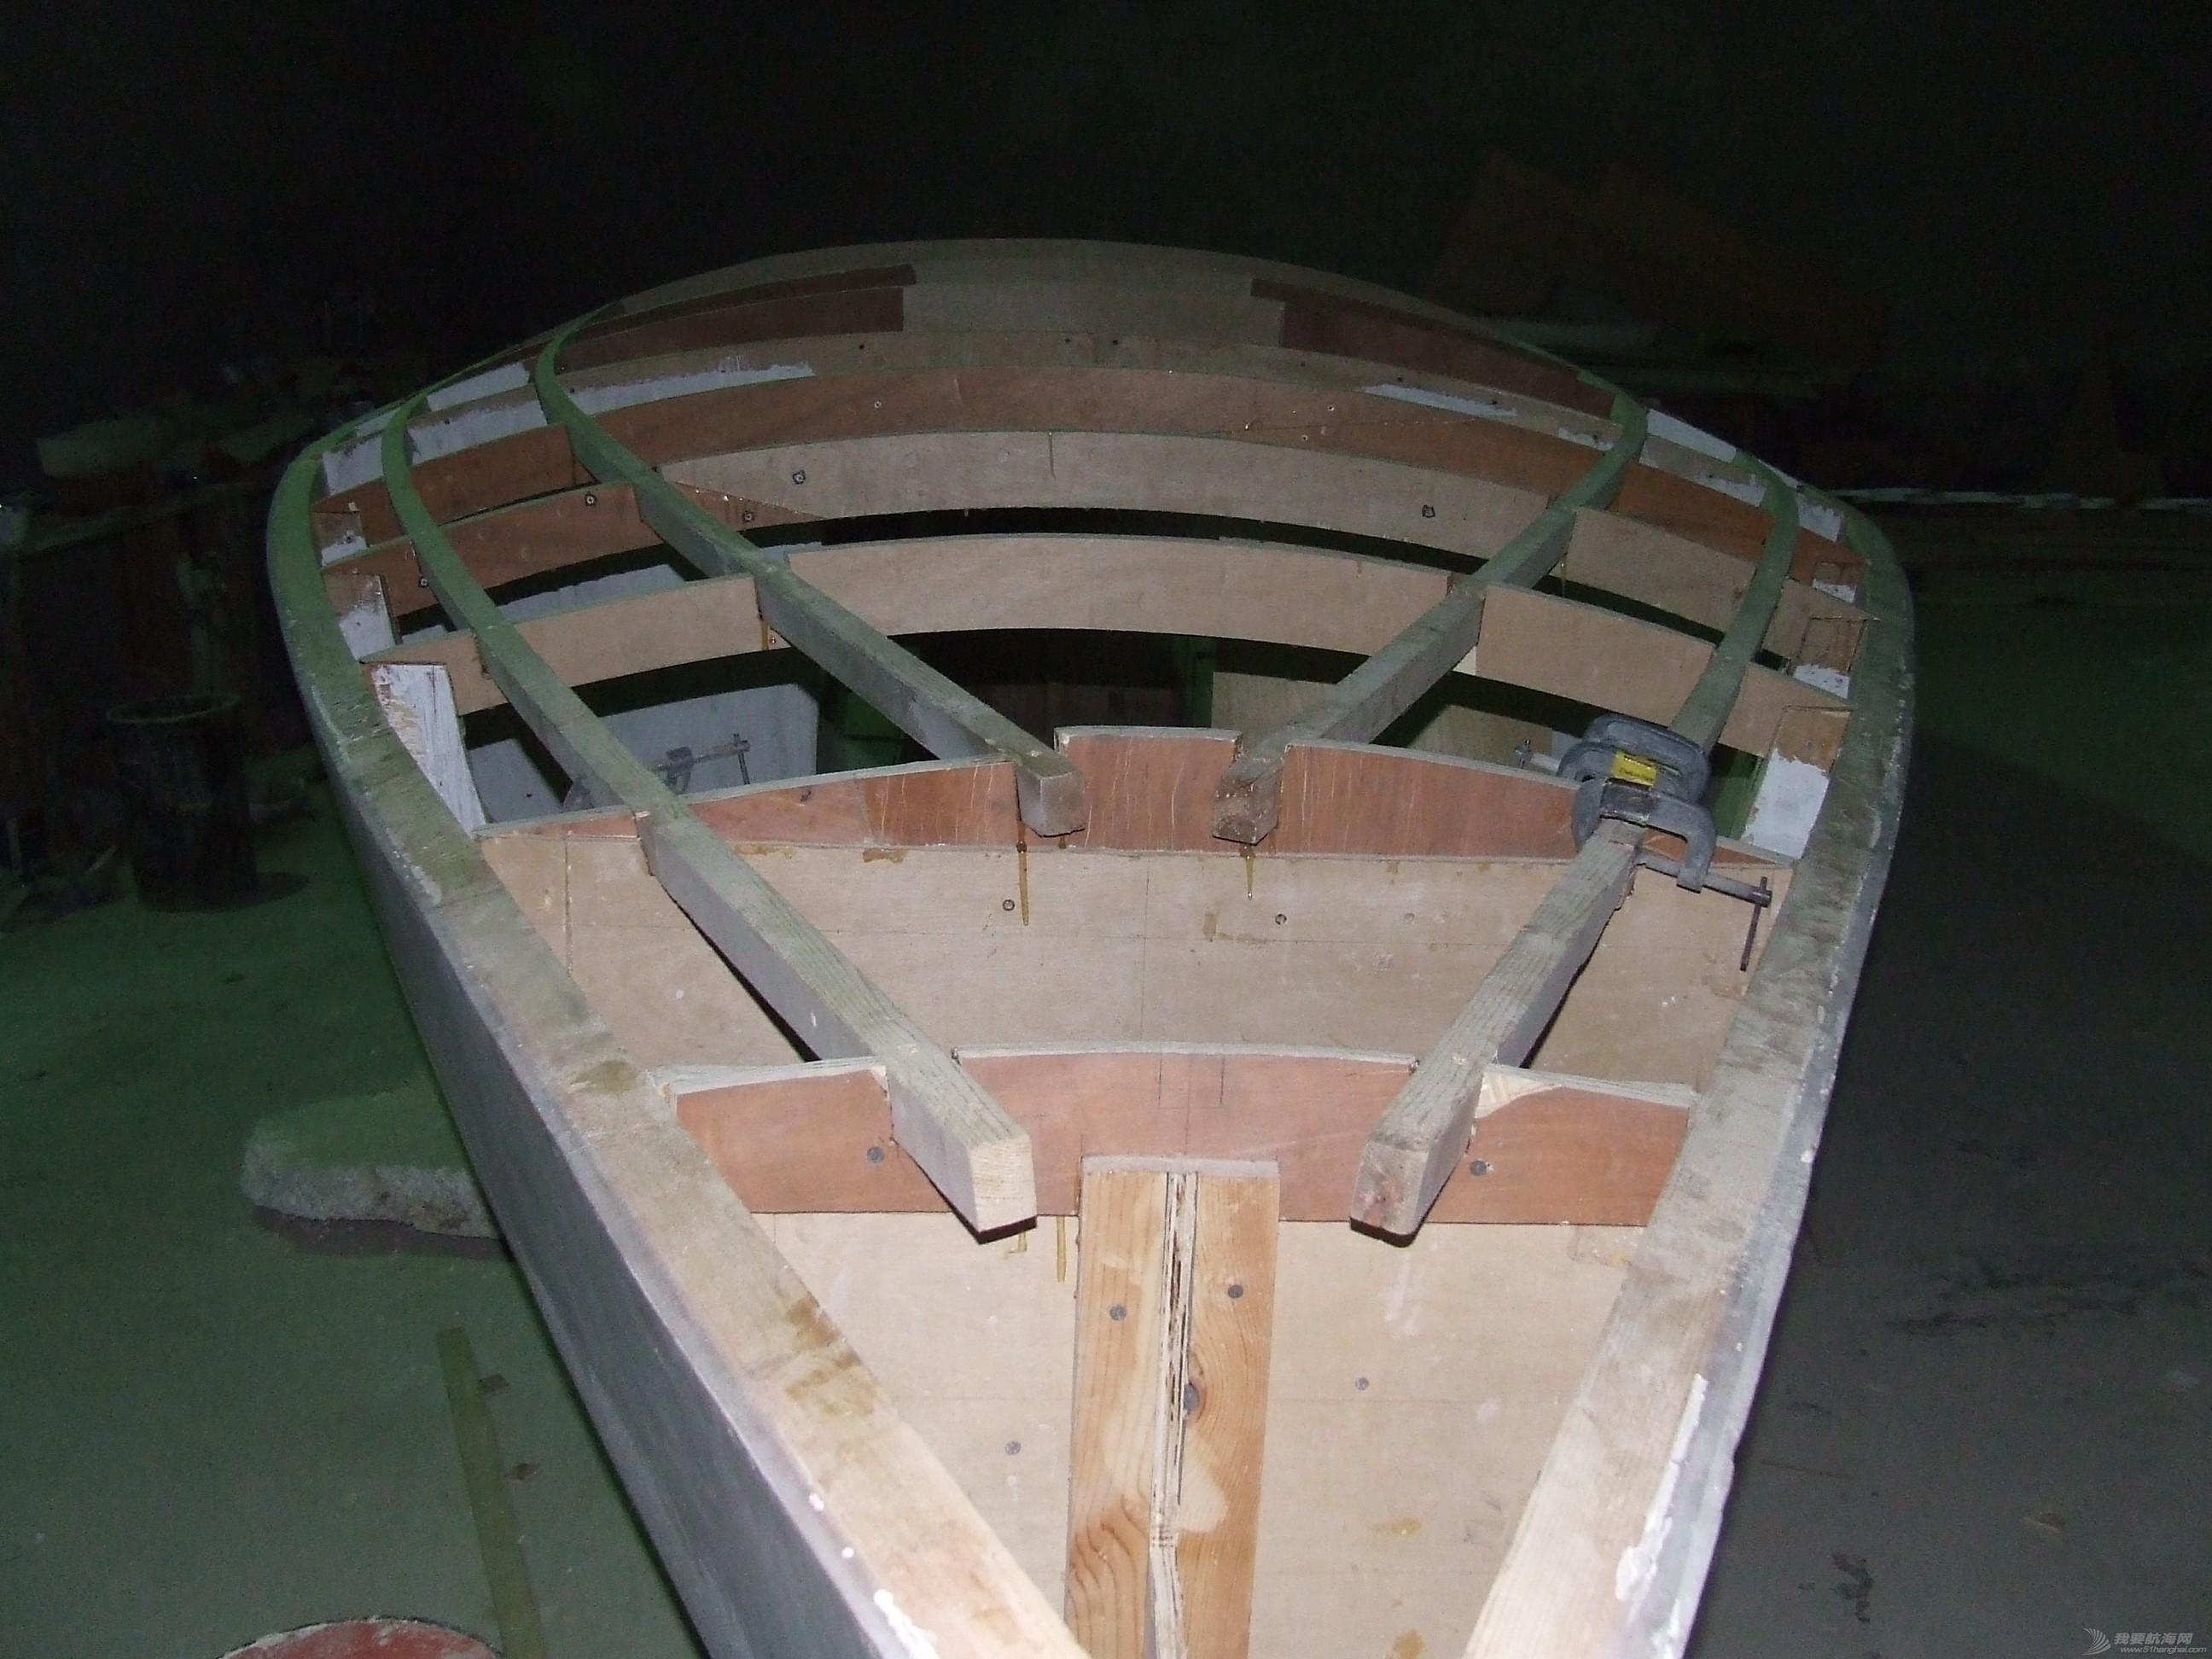 GR-750舱面面板铺装完毕 DSCF5812.JPG